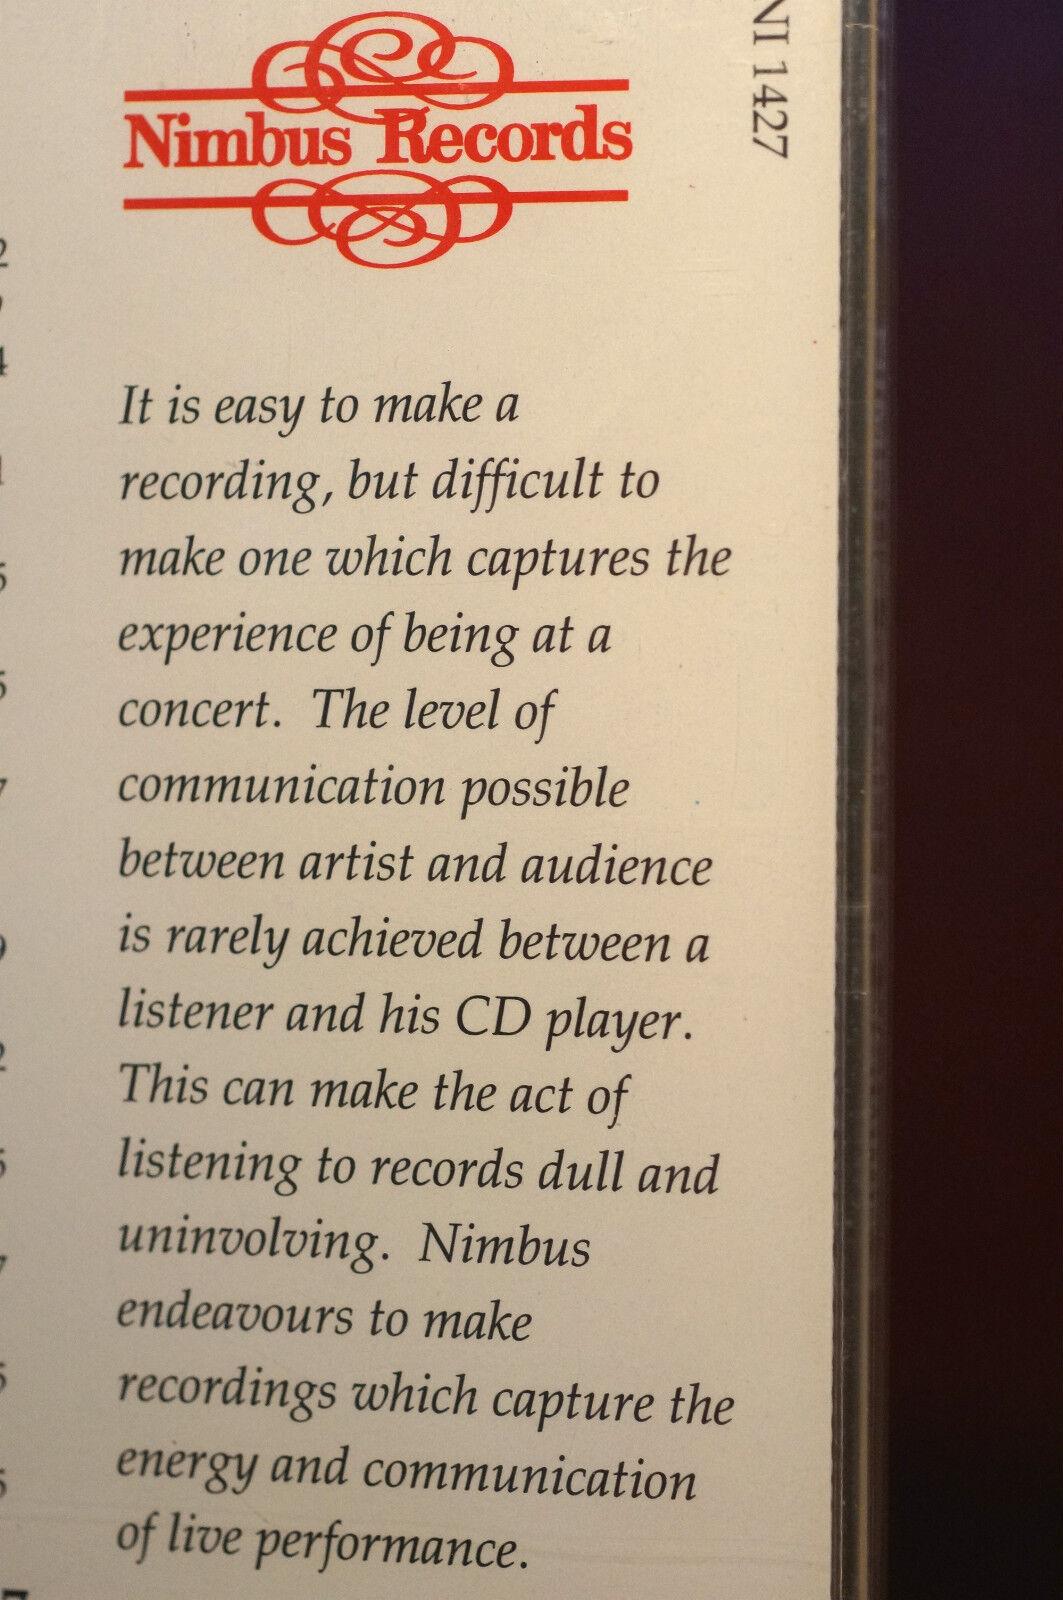 Nimbus Sampler Volume 3 With 76 Mins Compilation Audiophile MINT